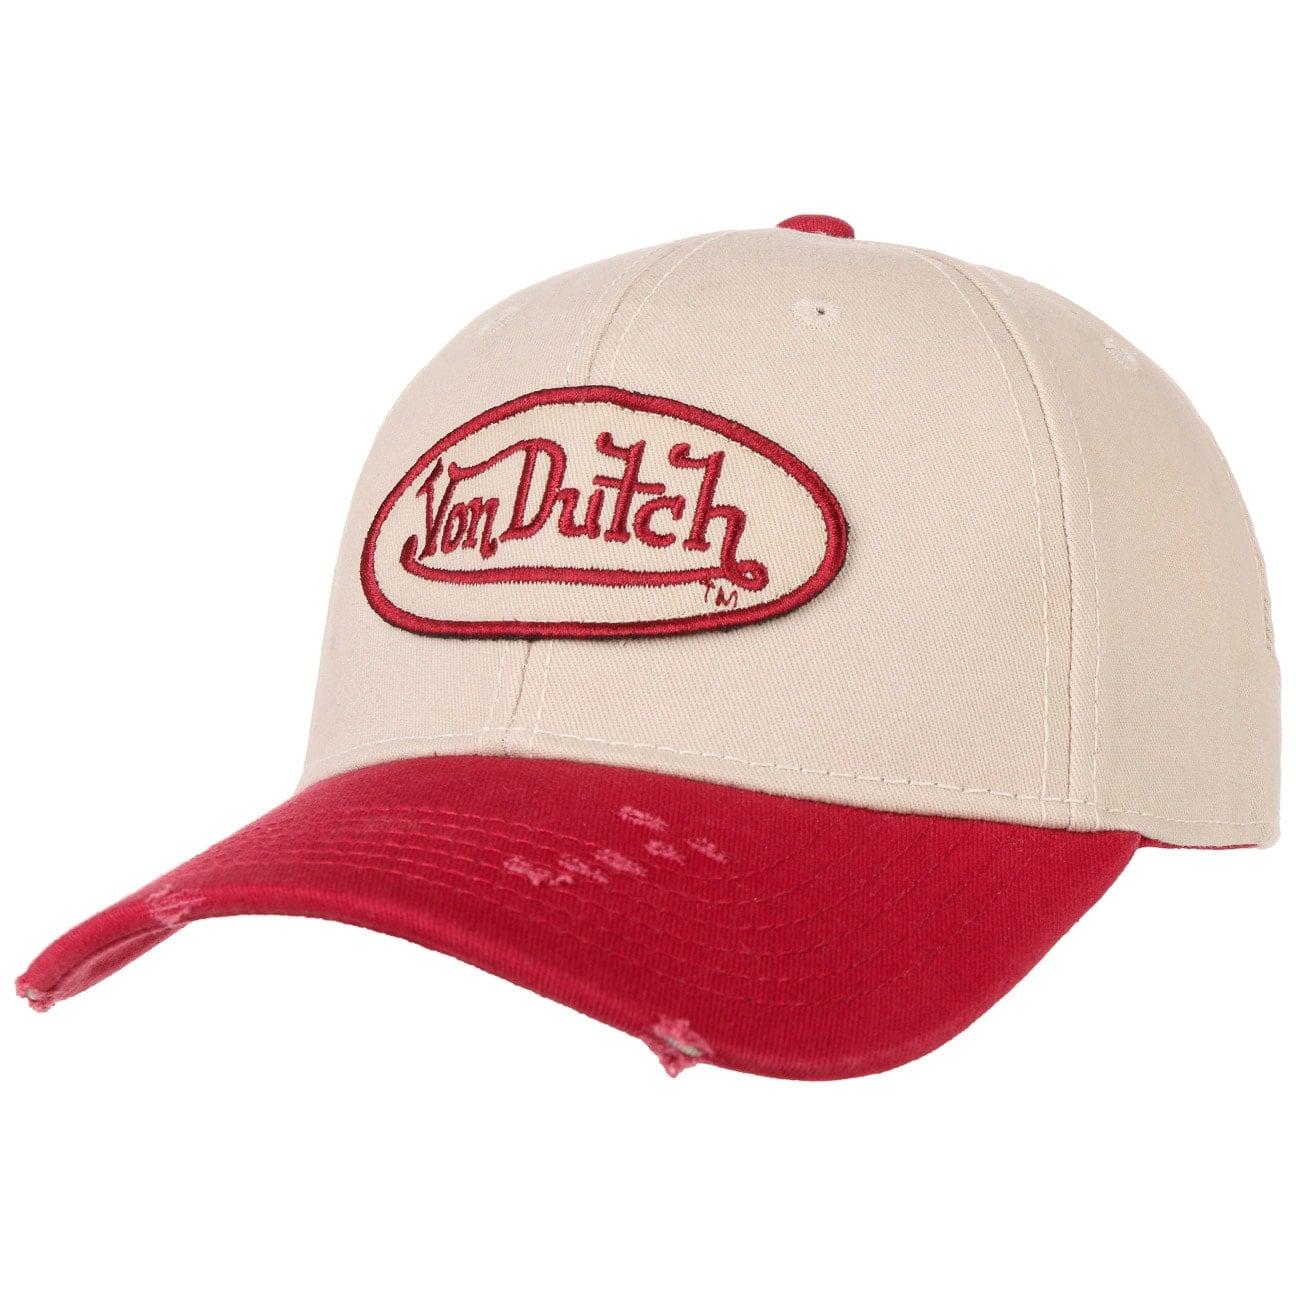 Gorra Snapback OG Dad by Von Dutch  curved brim cap